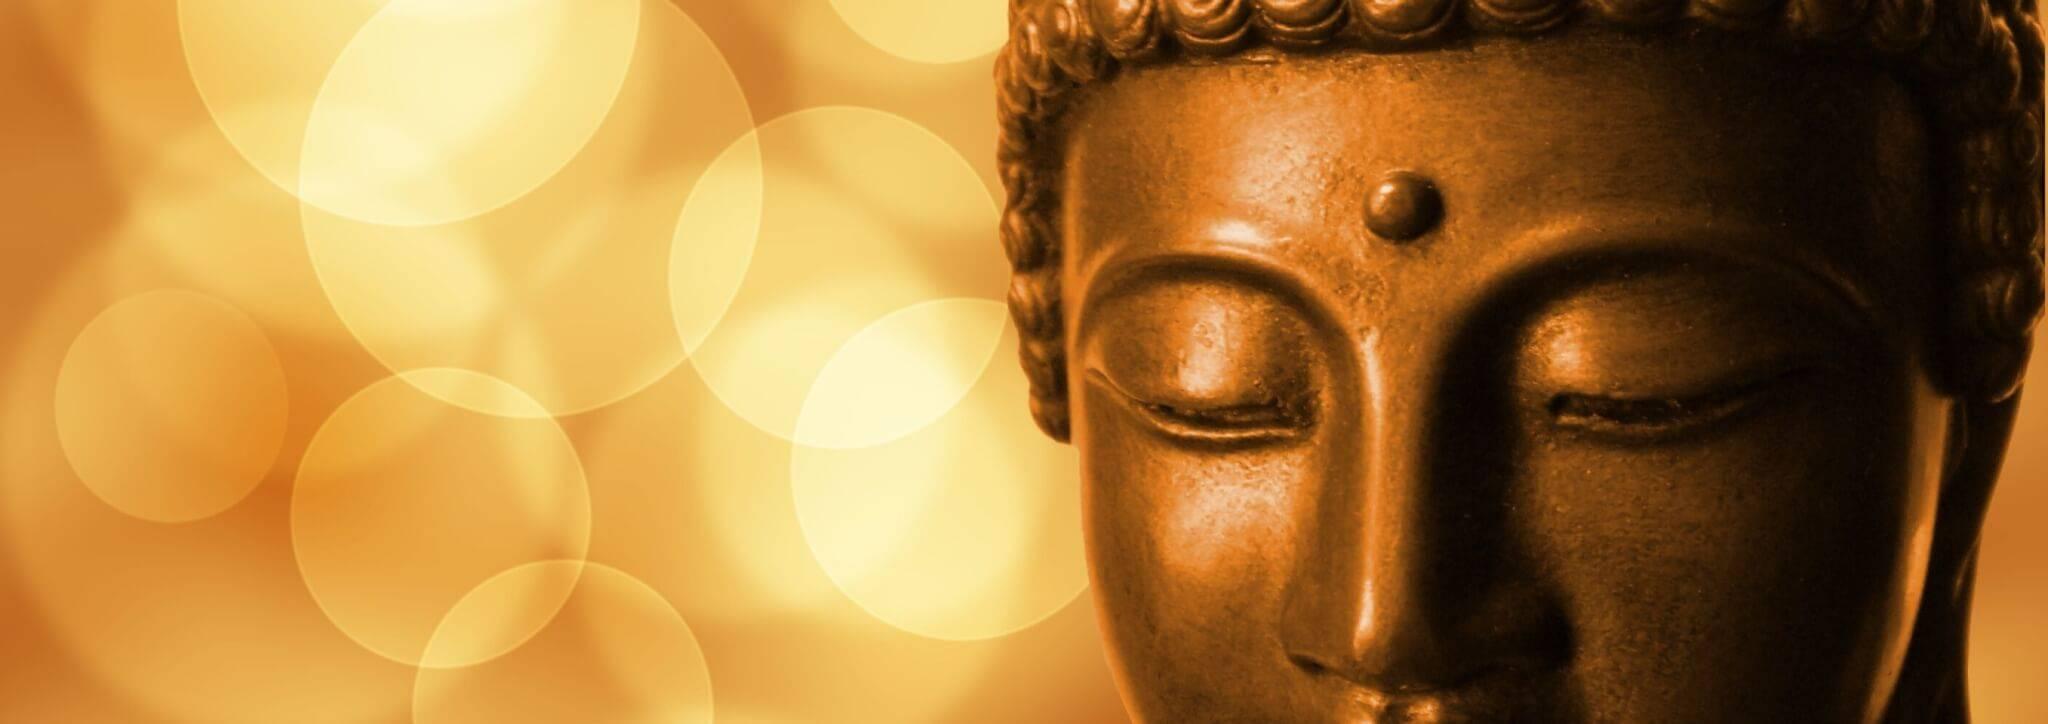 goudenles buddha